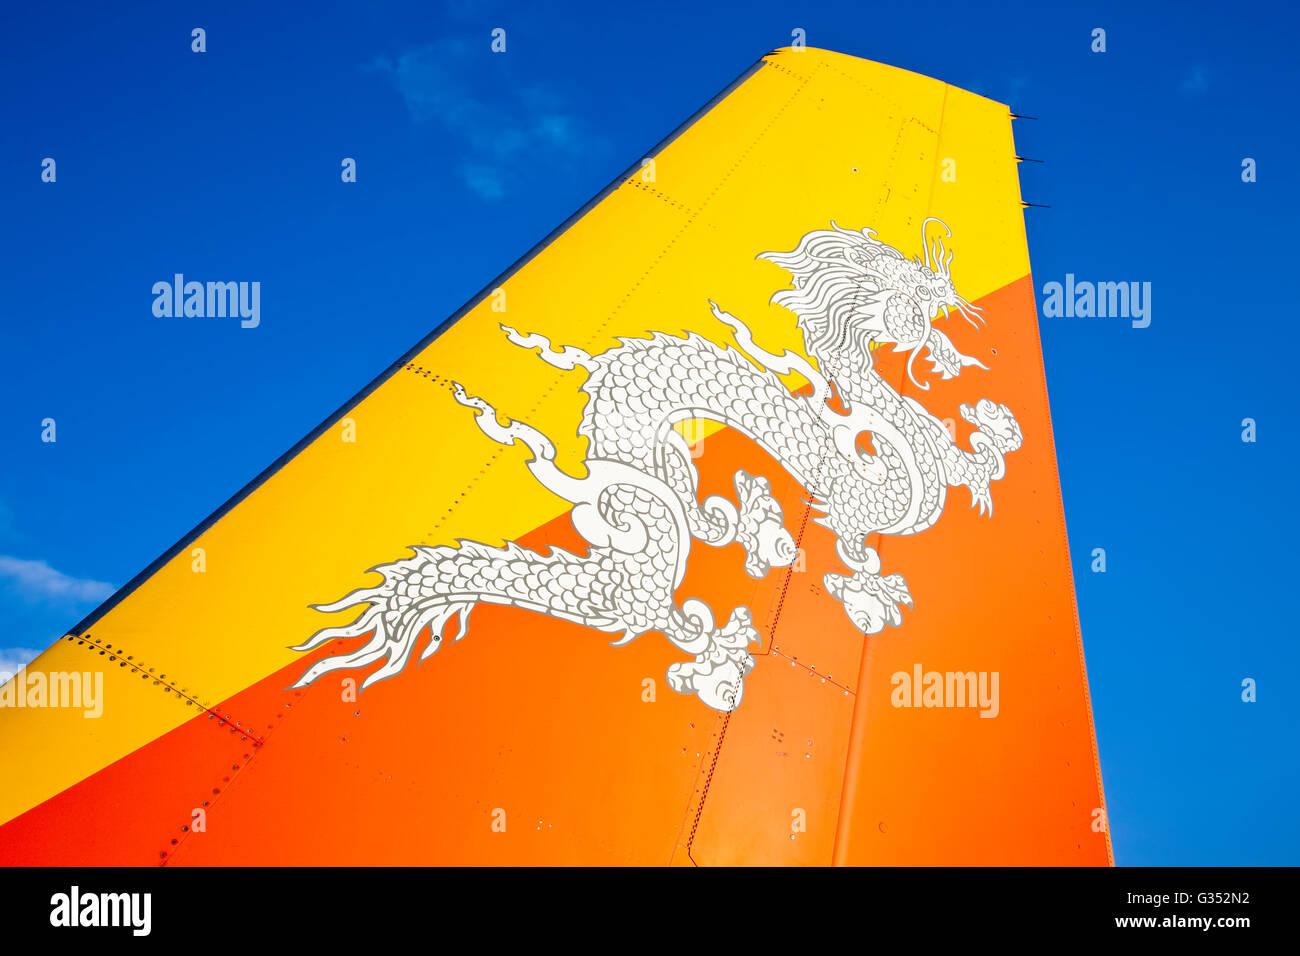 Druk Air Royal Bhutan Airlines Flugzeug Heck Mit Dem Land Nationale